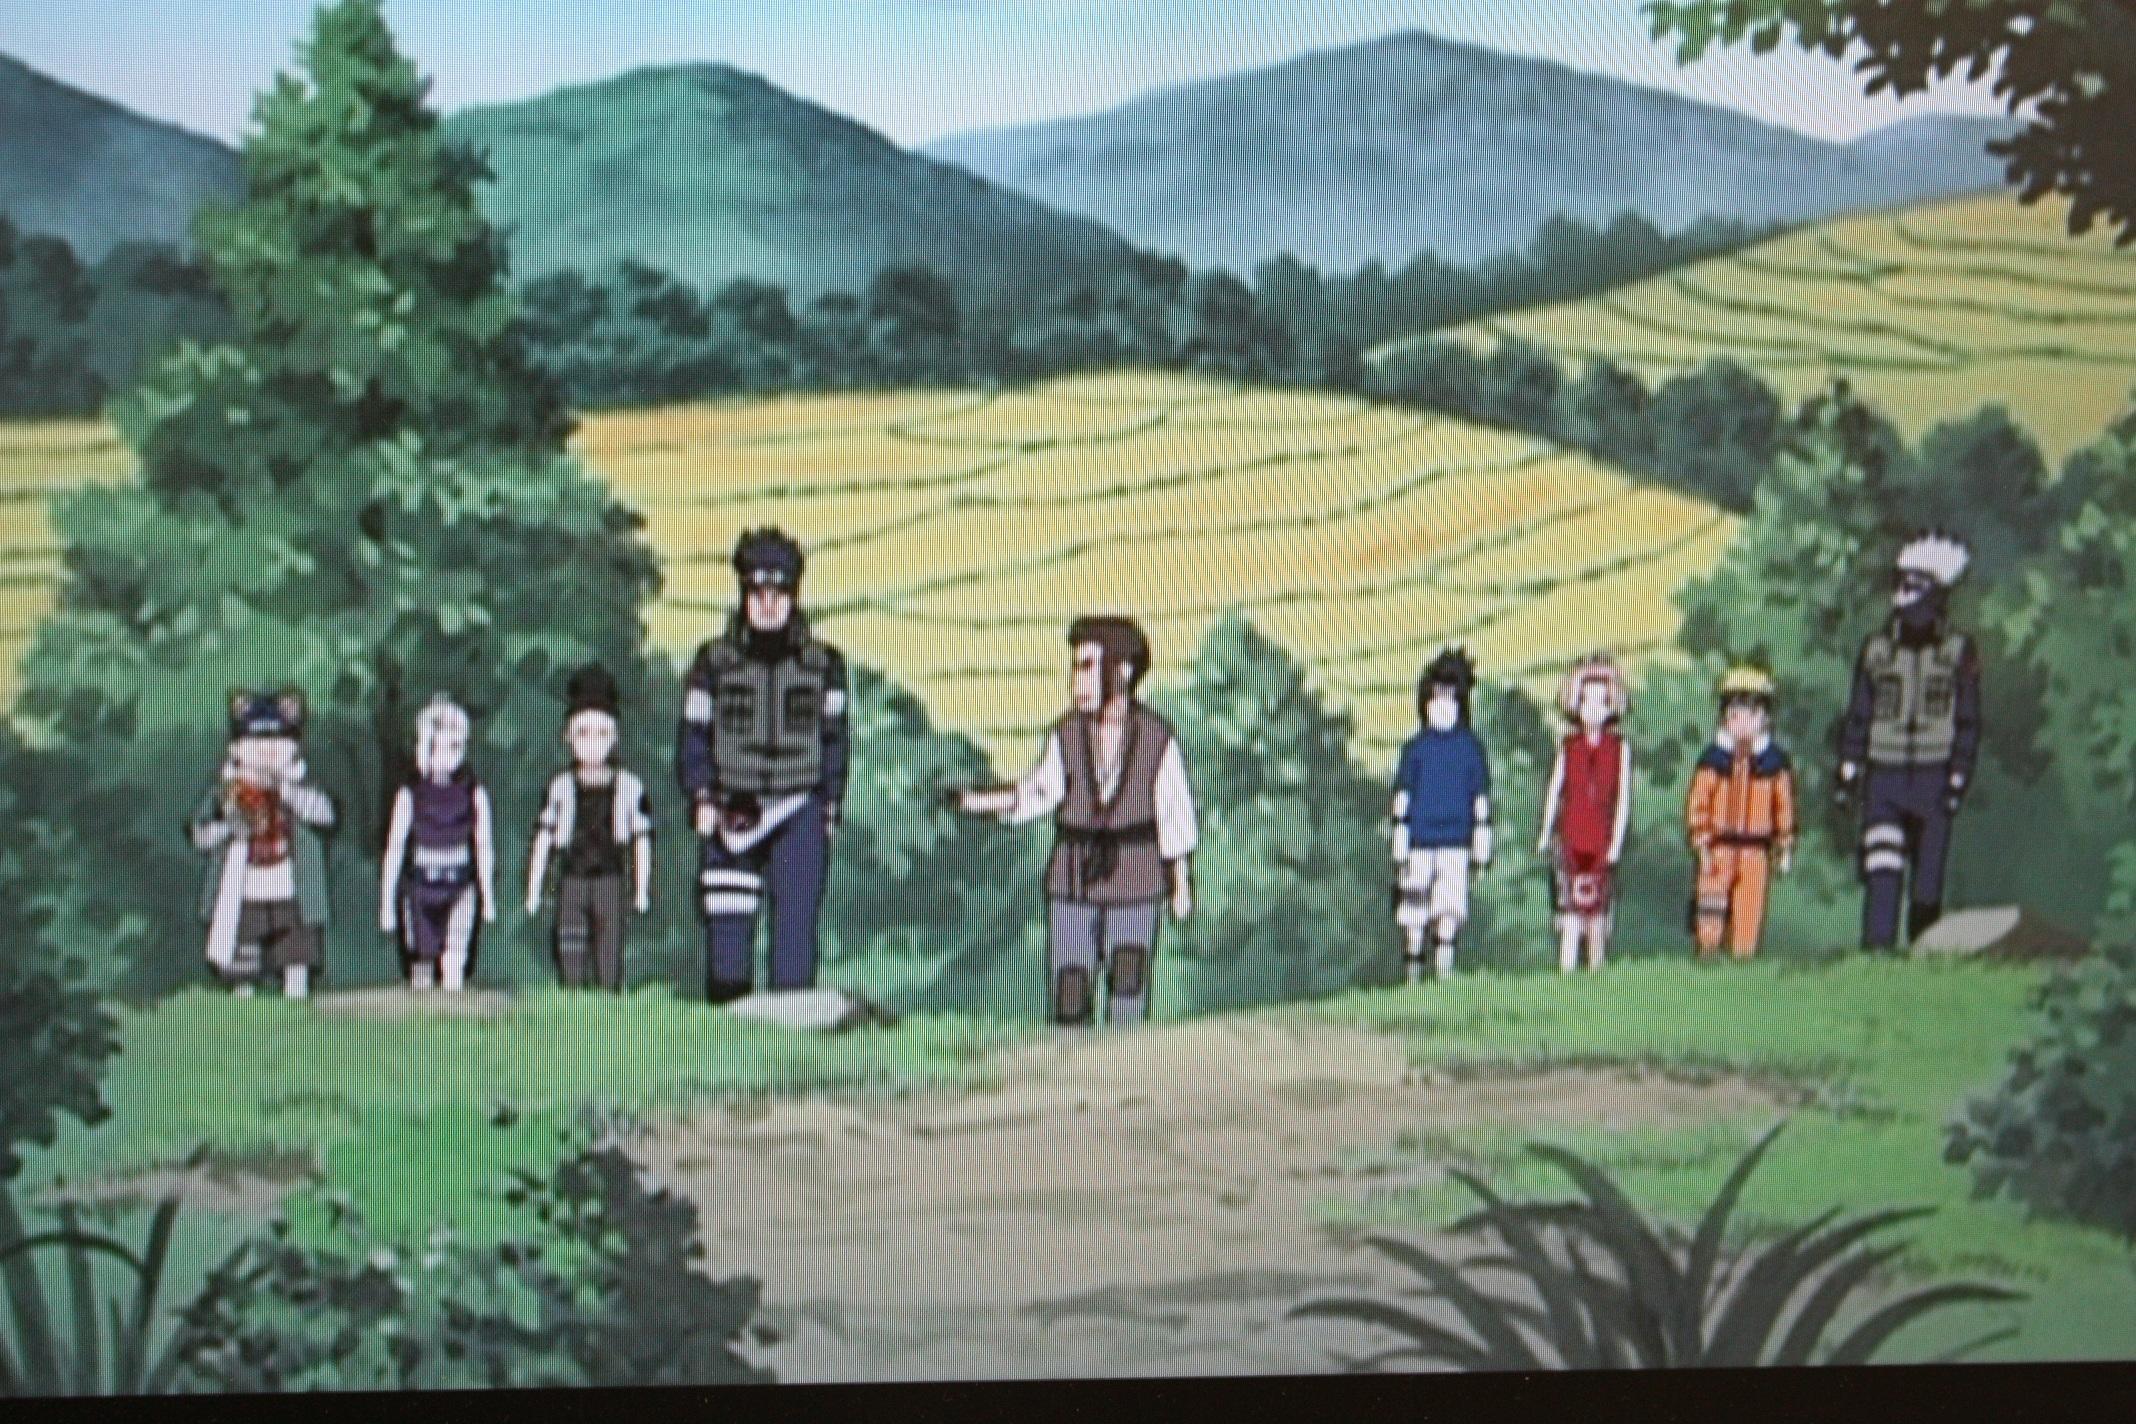 Naruto shippuden episode 19 gogoanime / Clinic movie trailer